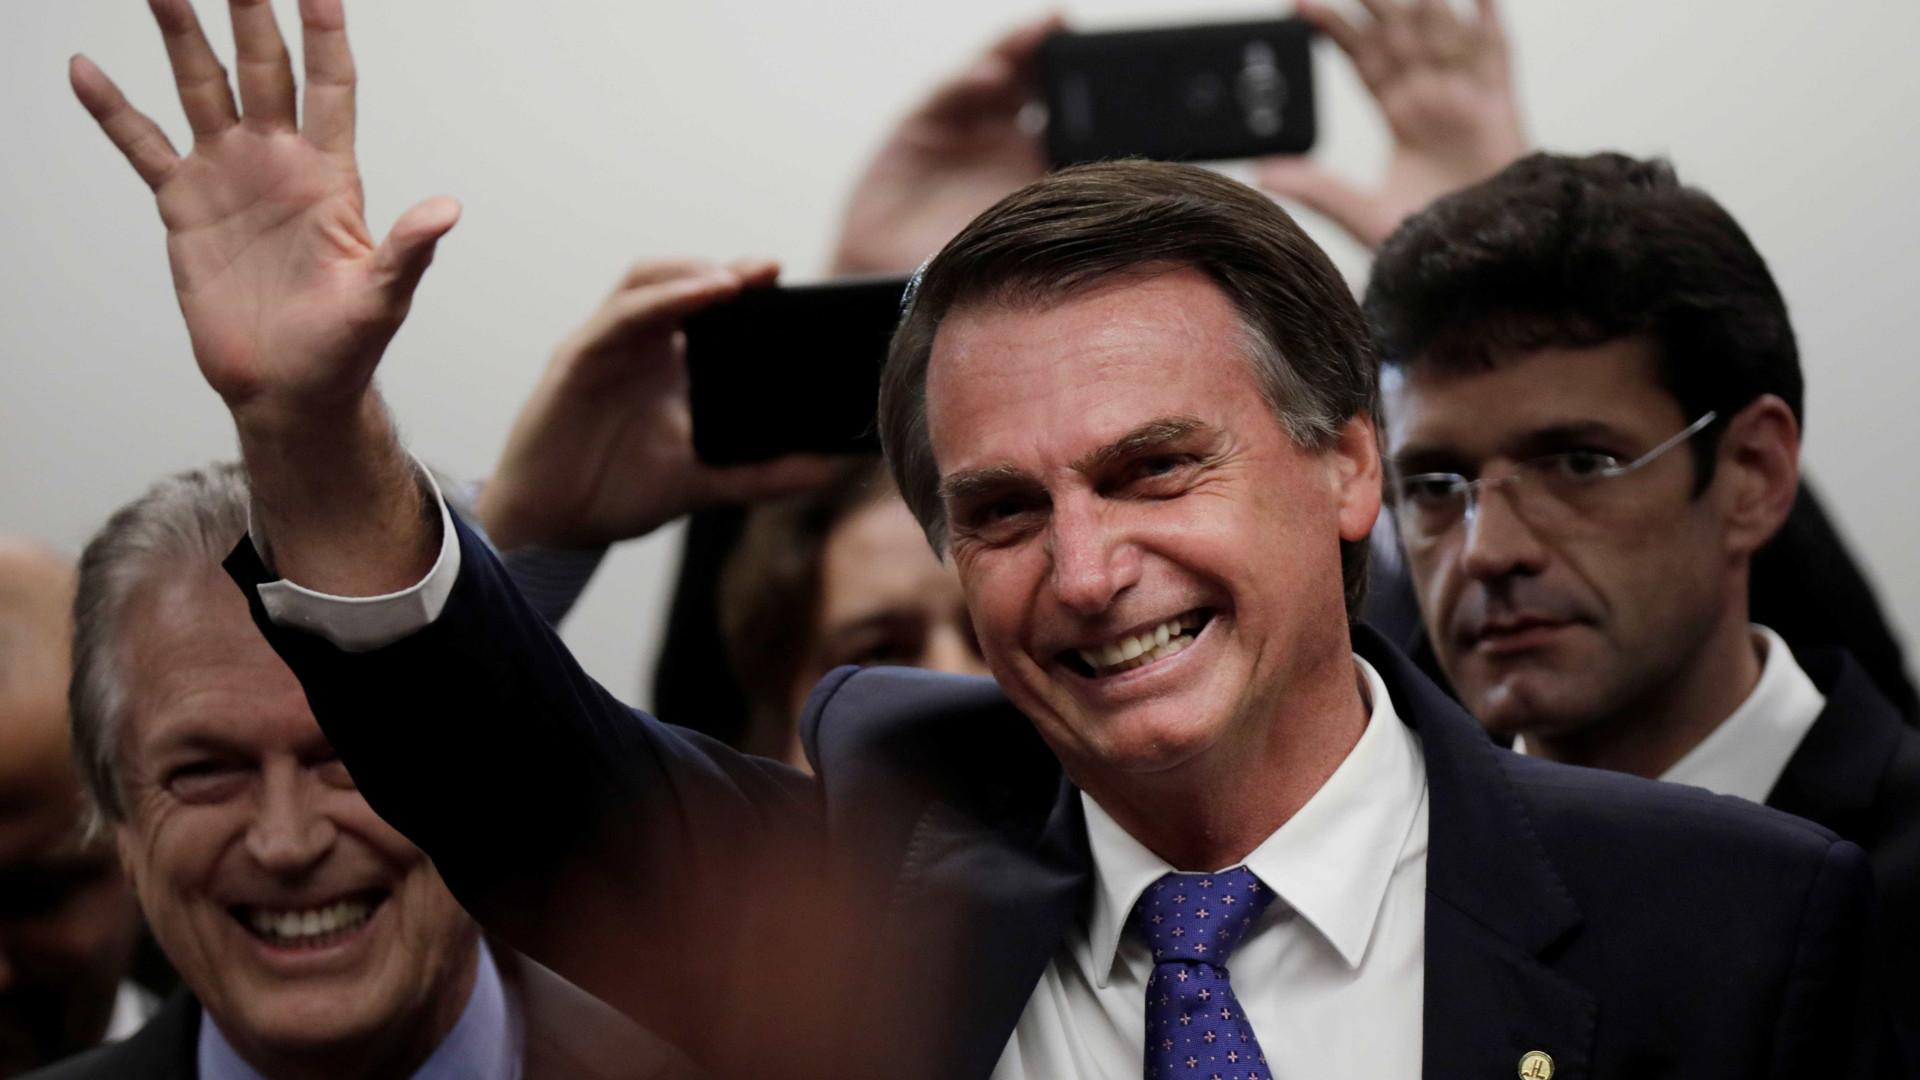 Candidatura de Bolsonaro é 'voo de galinha', diz coordenador de Alckmin